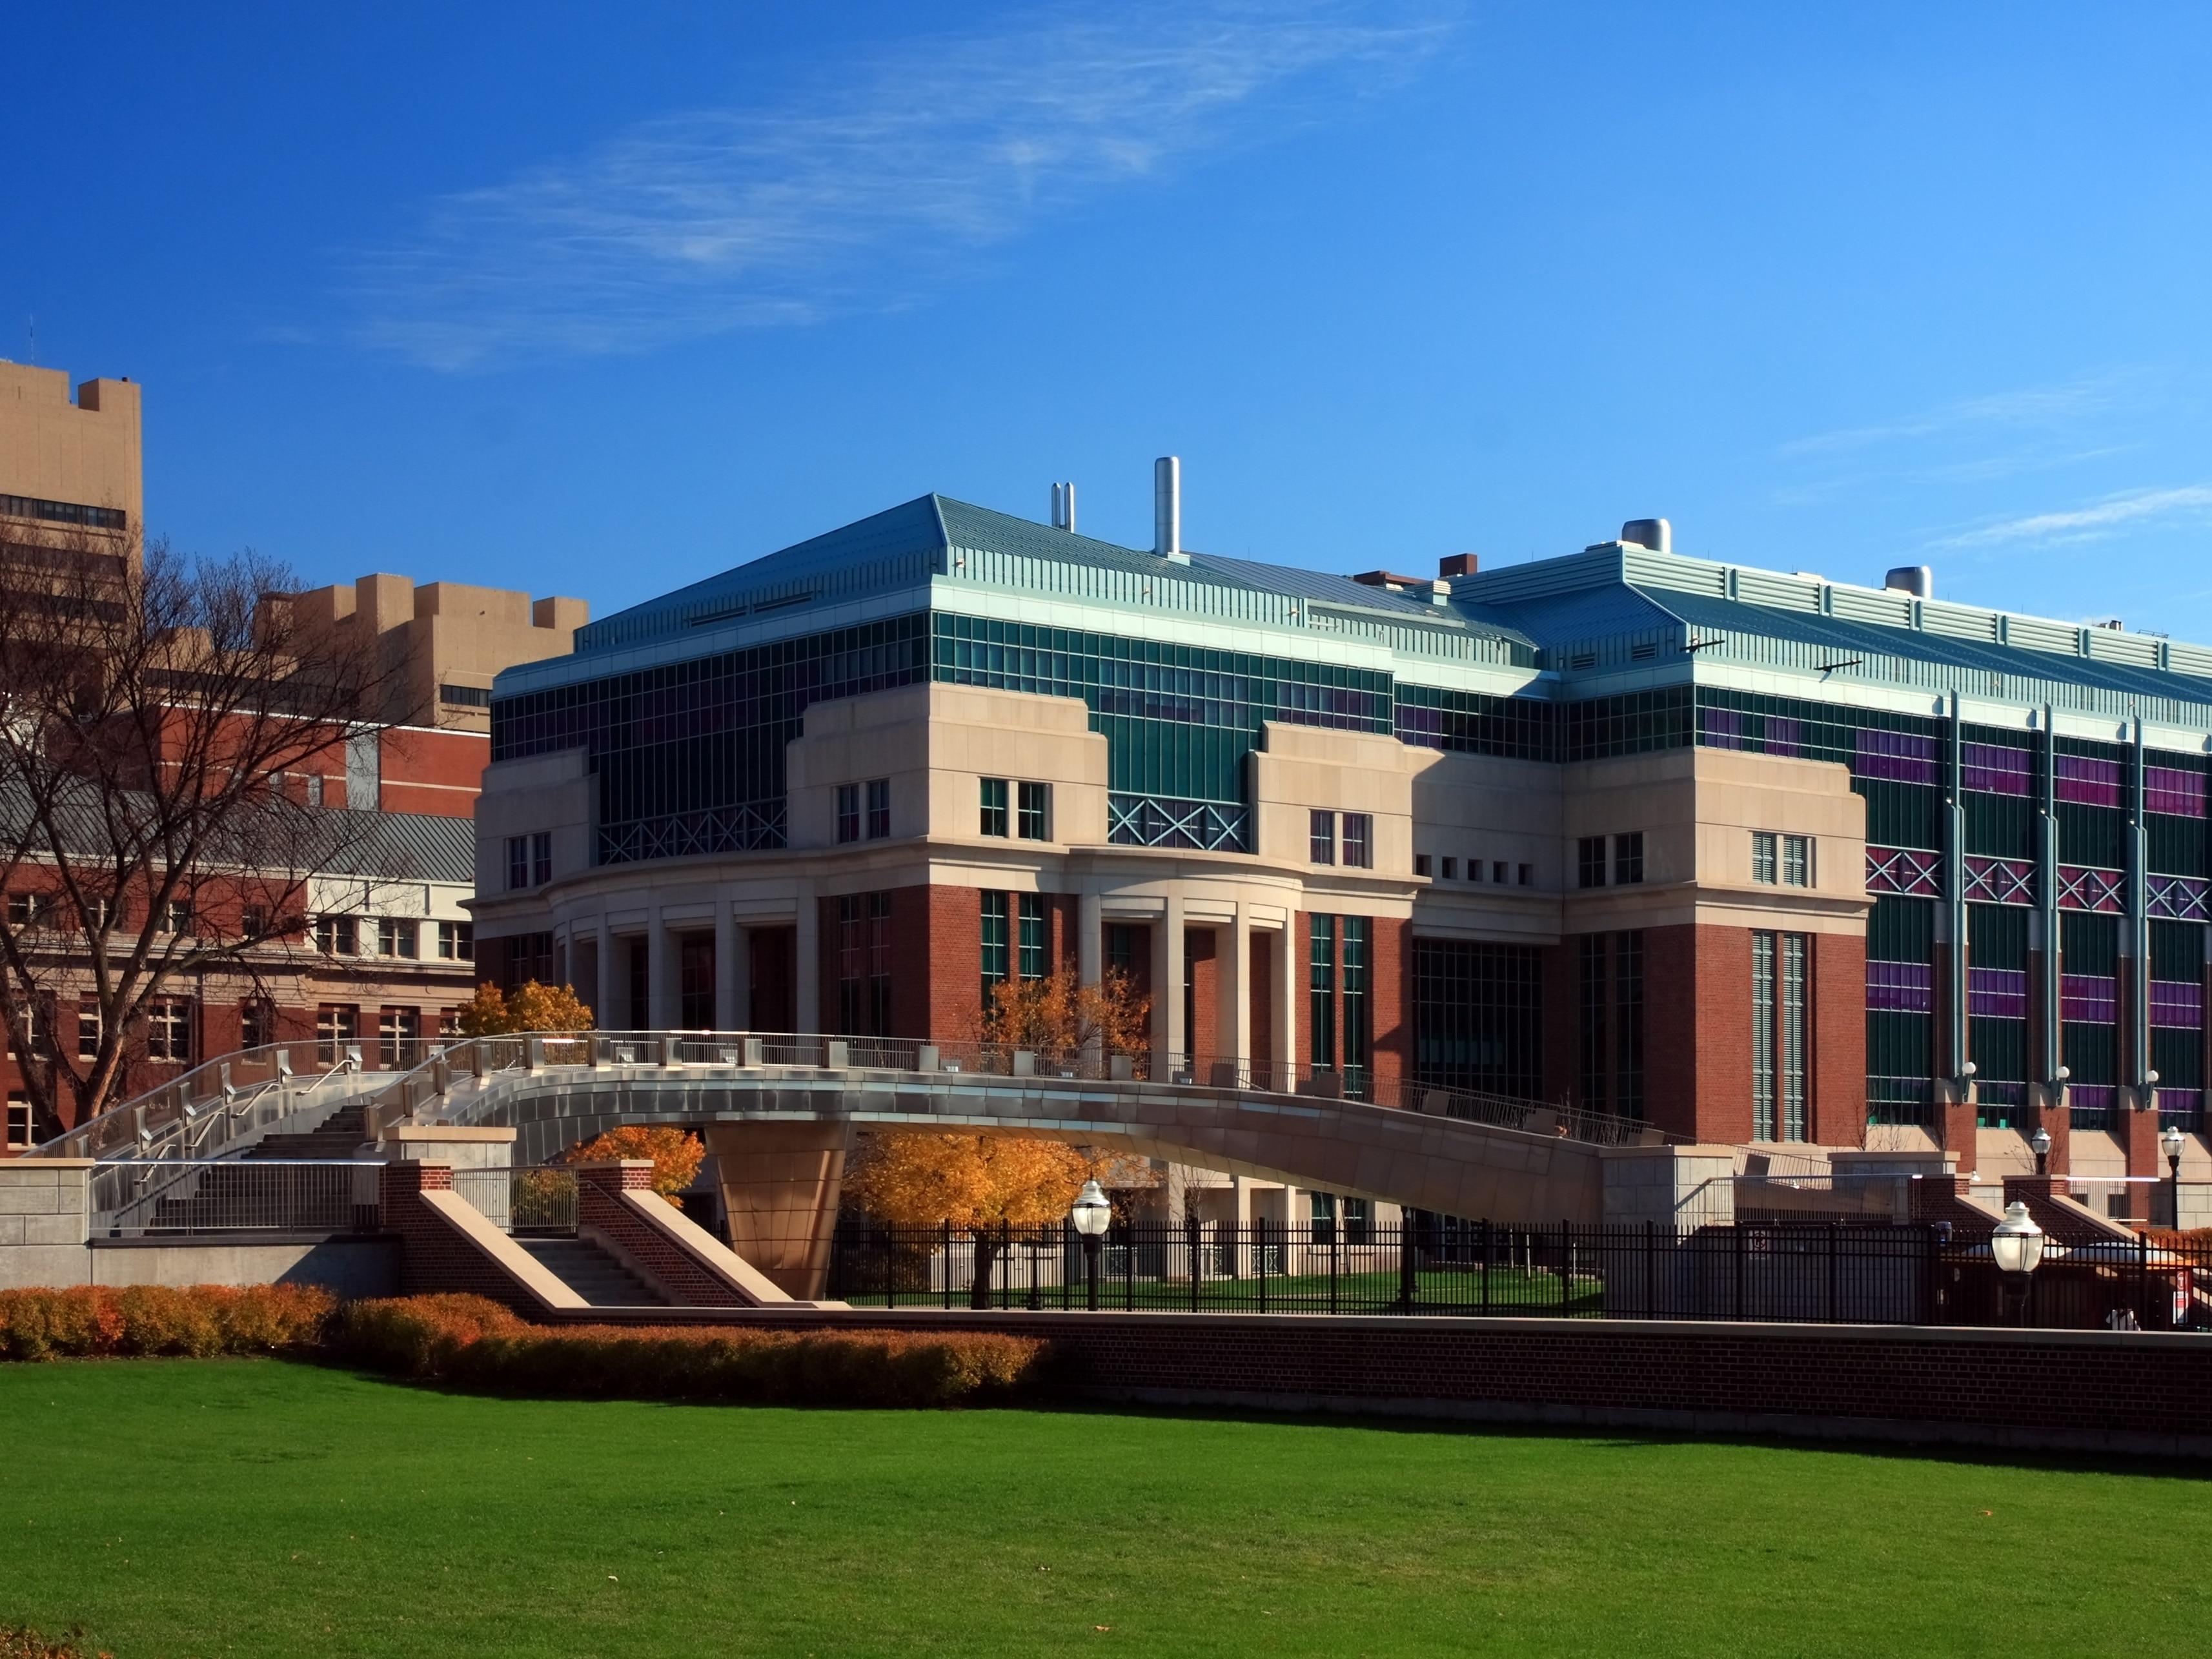 St. Anthony Park, St. Paul, Minnesota, United States of America